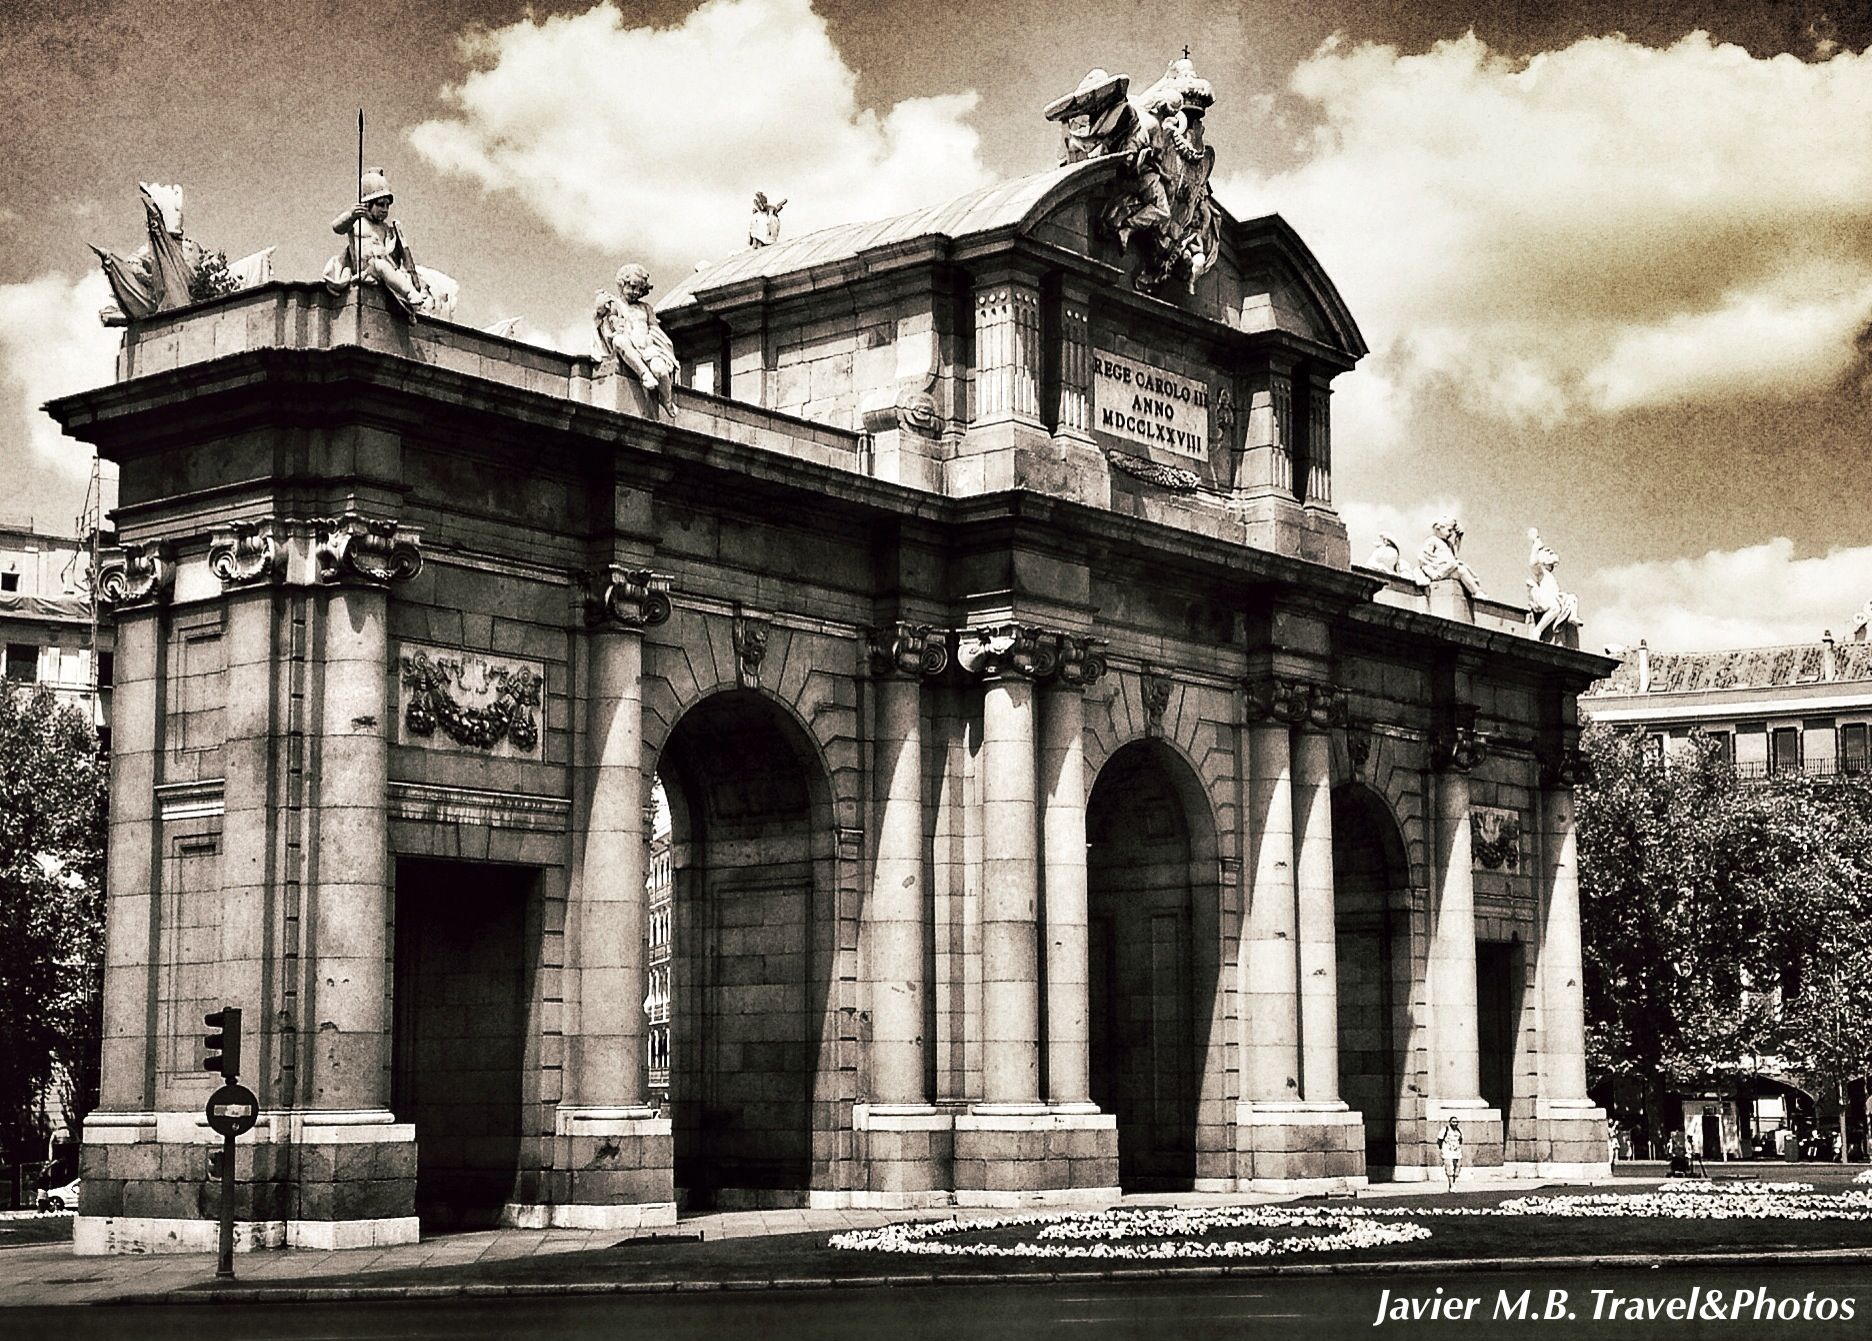 Puerta de Alcalá...